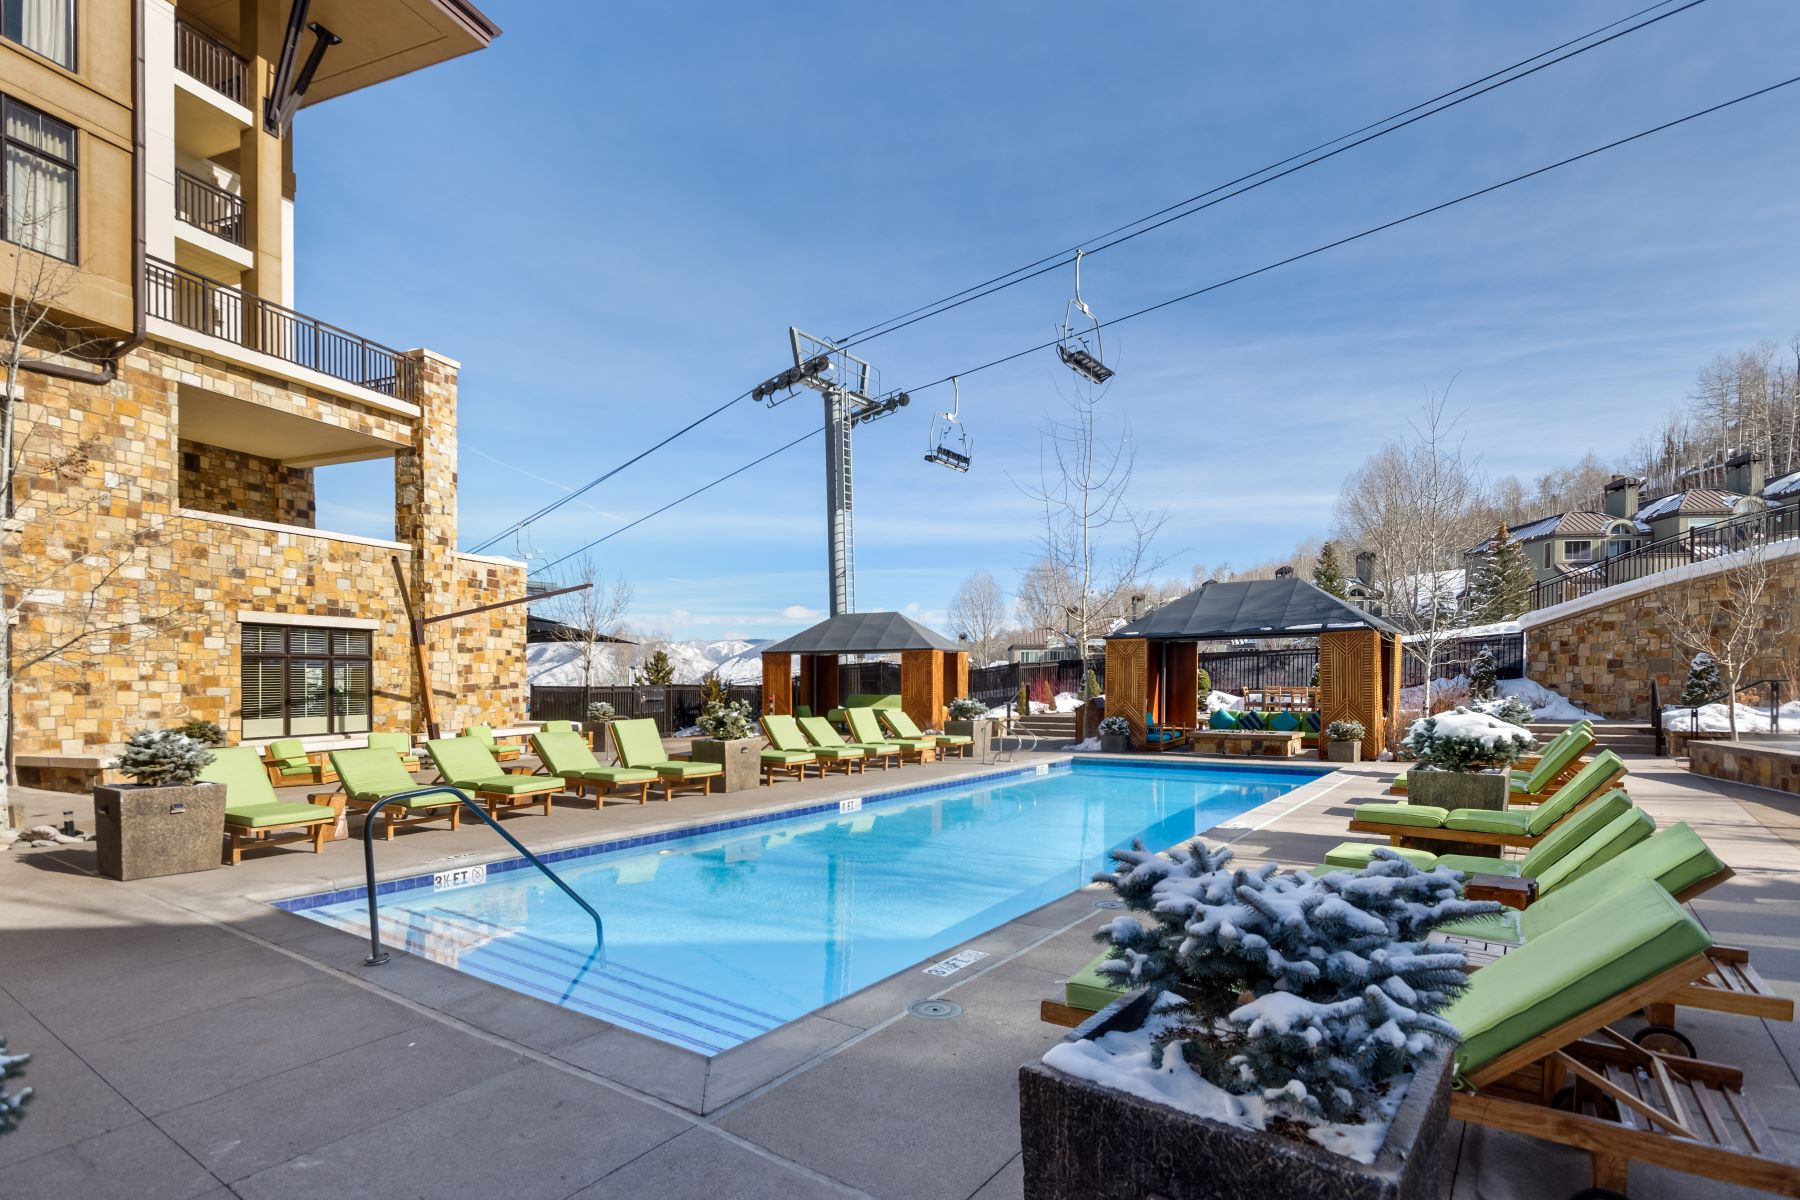 Condominiums для того Продажа на Assay Hill Lodge 624/634 130 Wood Road, Units 624/634, Snowmass Village, Колорадо 81615 Соединенные Штаты